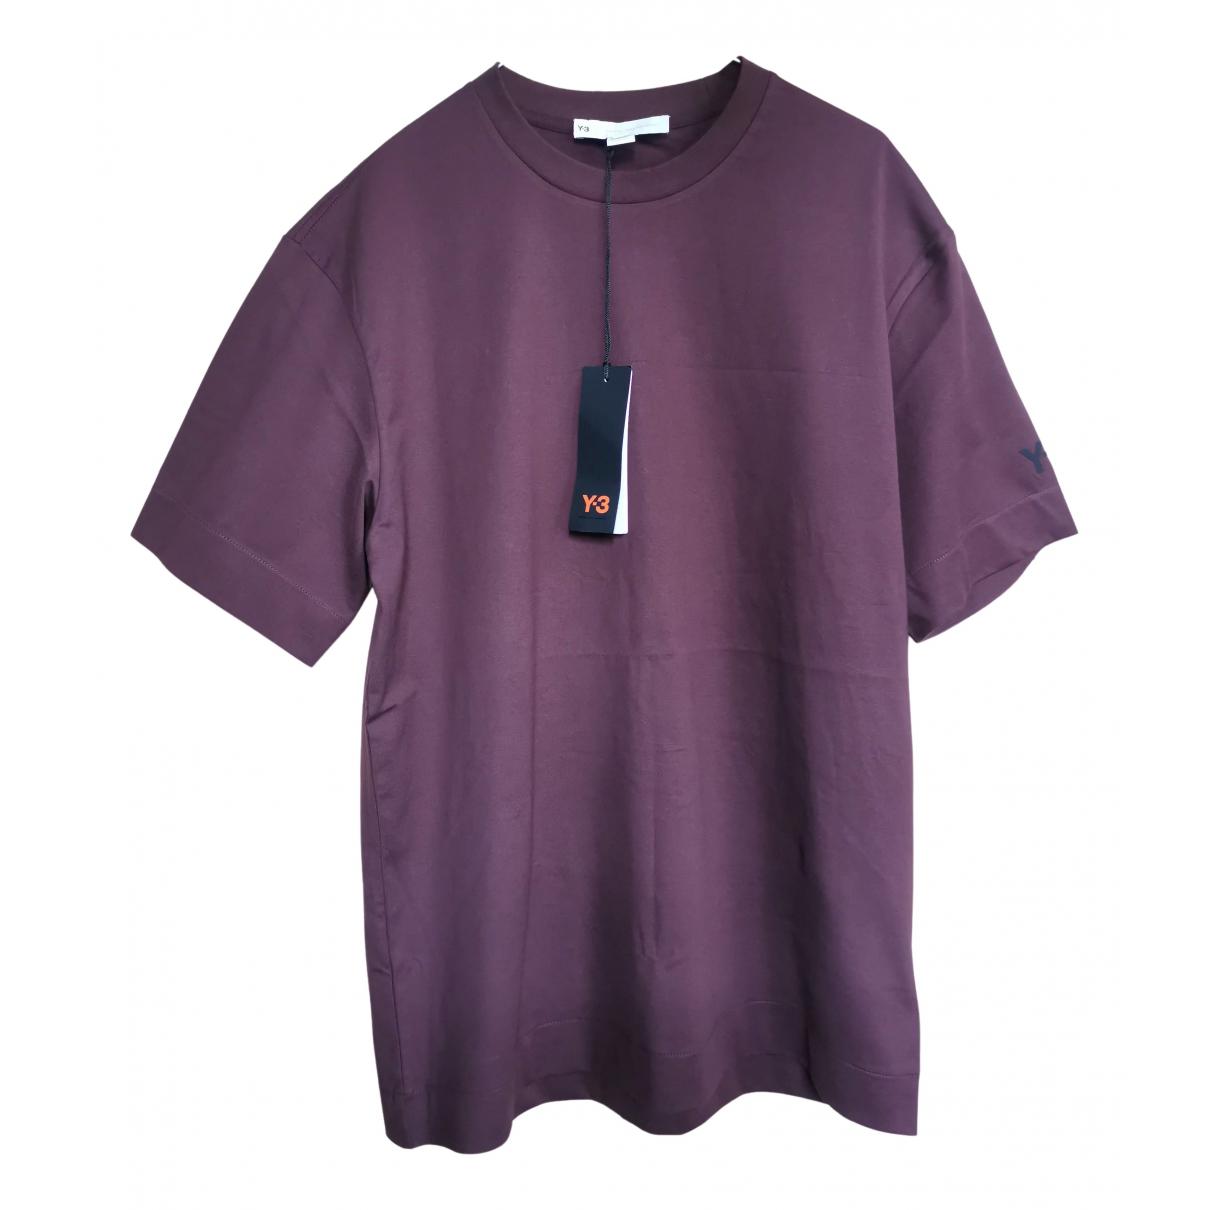 Y-3 By Yohji Yamamoto - Tee shirts   pour homme en coton - bordeaux